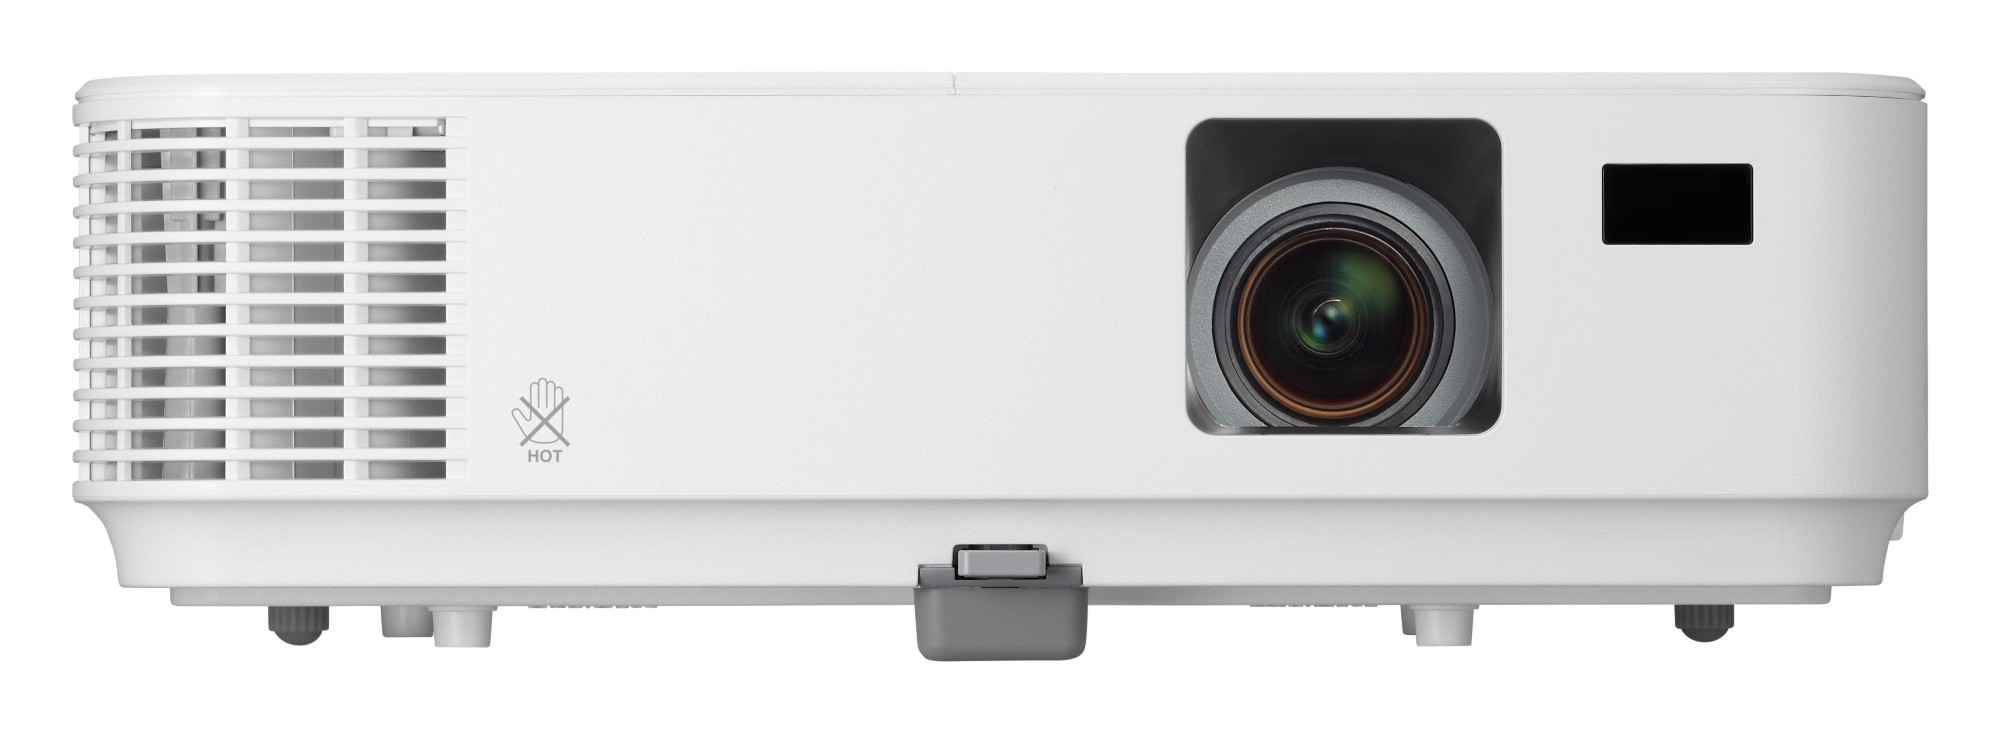 NEC V302W Desktop projector 3000ANSI lumens DLP WXGA (1280x800) 3D White data projector